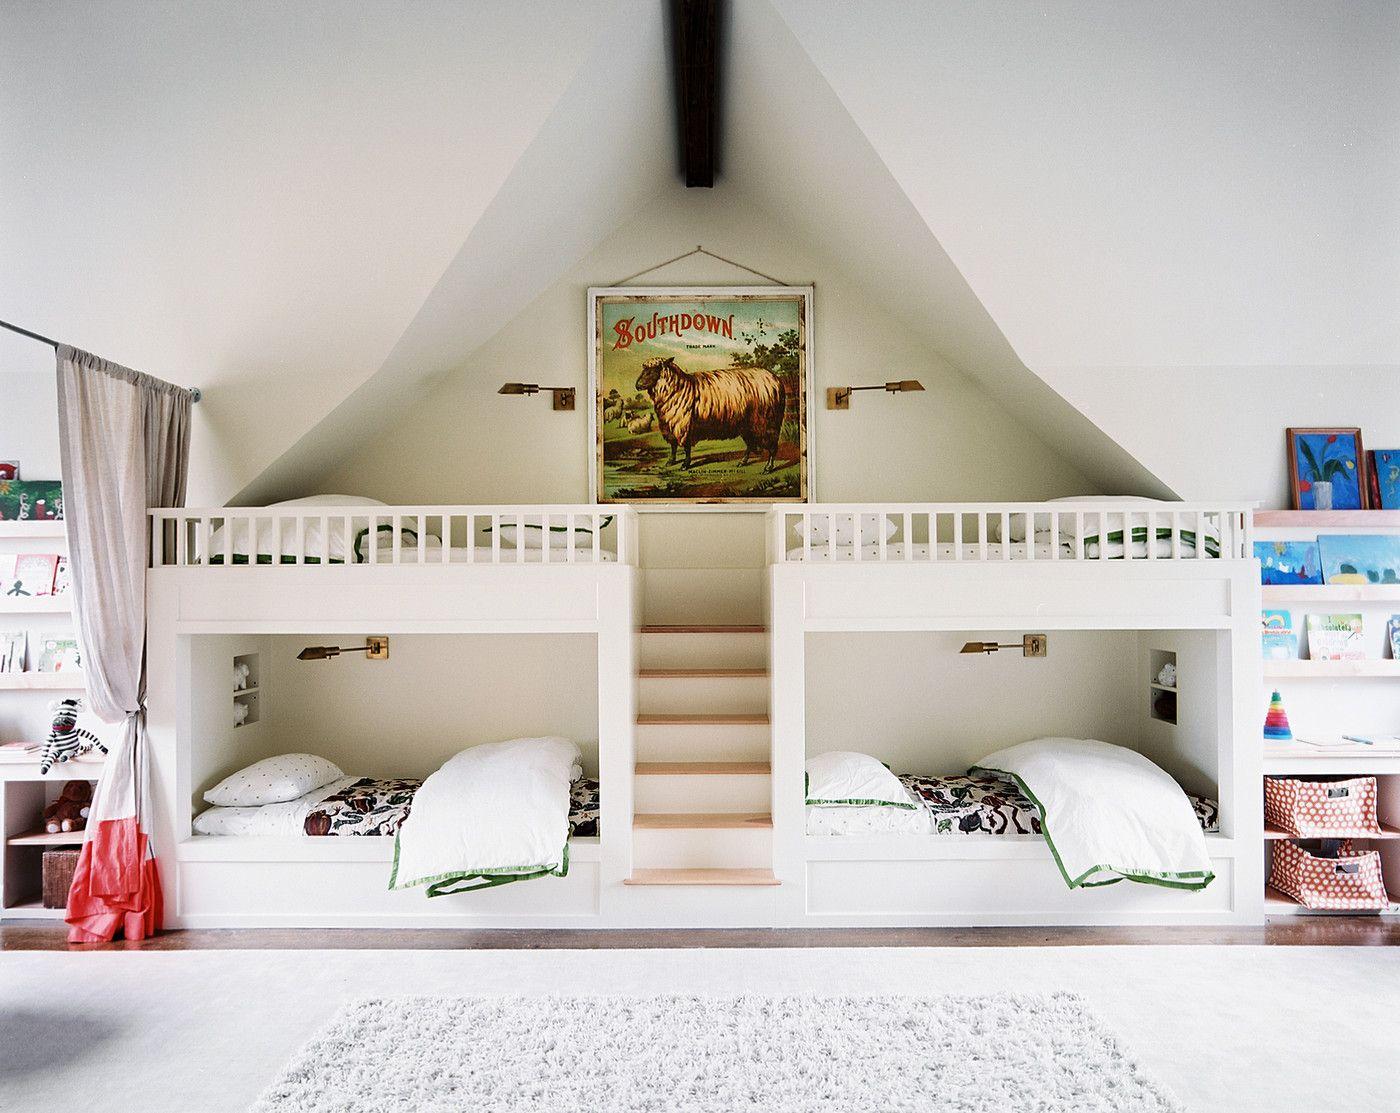 Childrens Bedroom Wall Designs Entrancing 15 Sorprenderte Ideas De Diseño De Literas  Lisa Bunk Bed And Decorating Inspiration